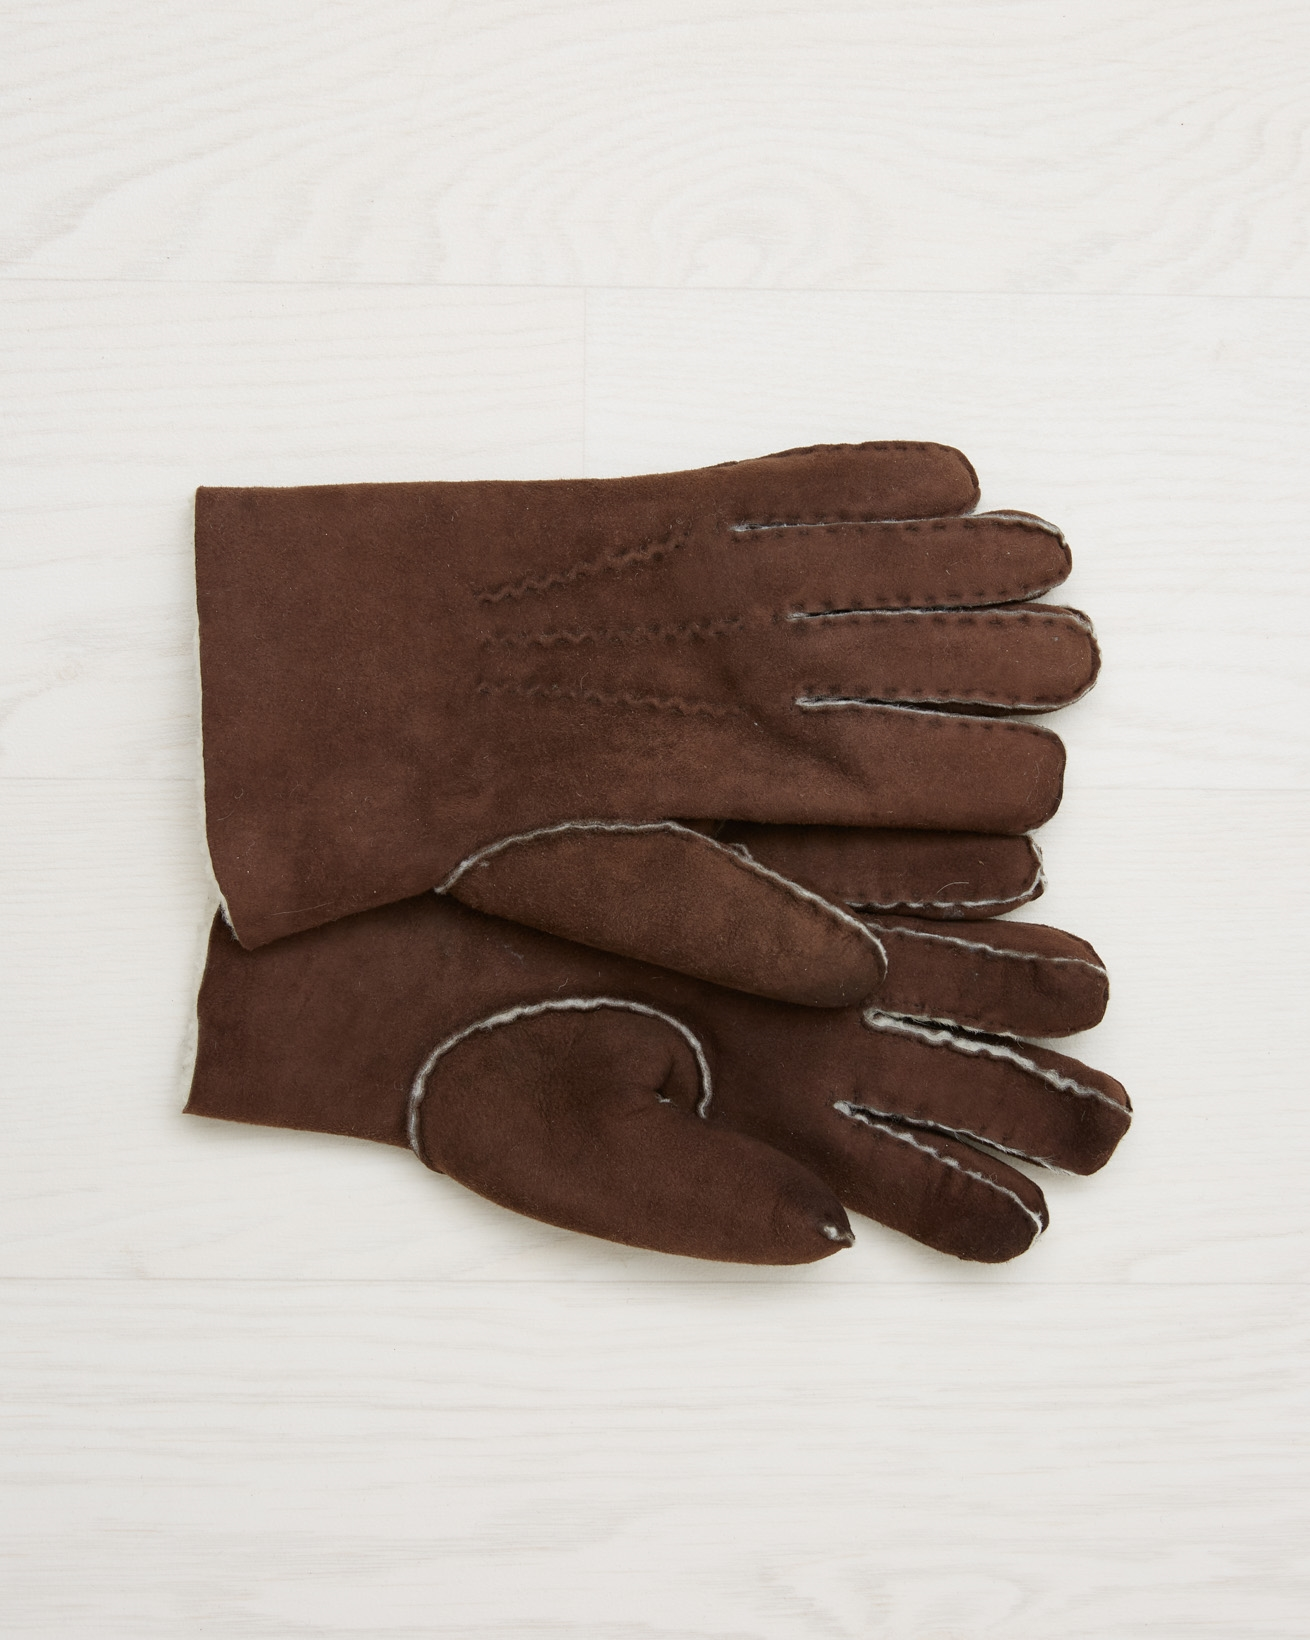 Sheepskin Gloves - Mocca - Size Small - 2561